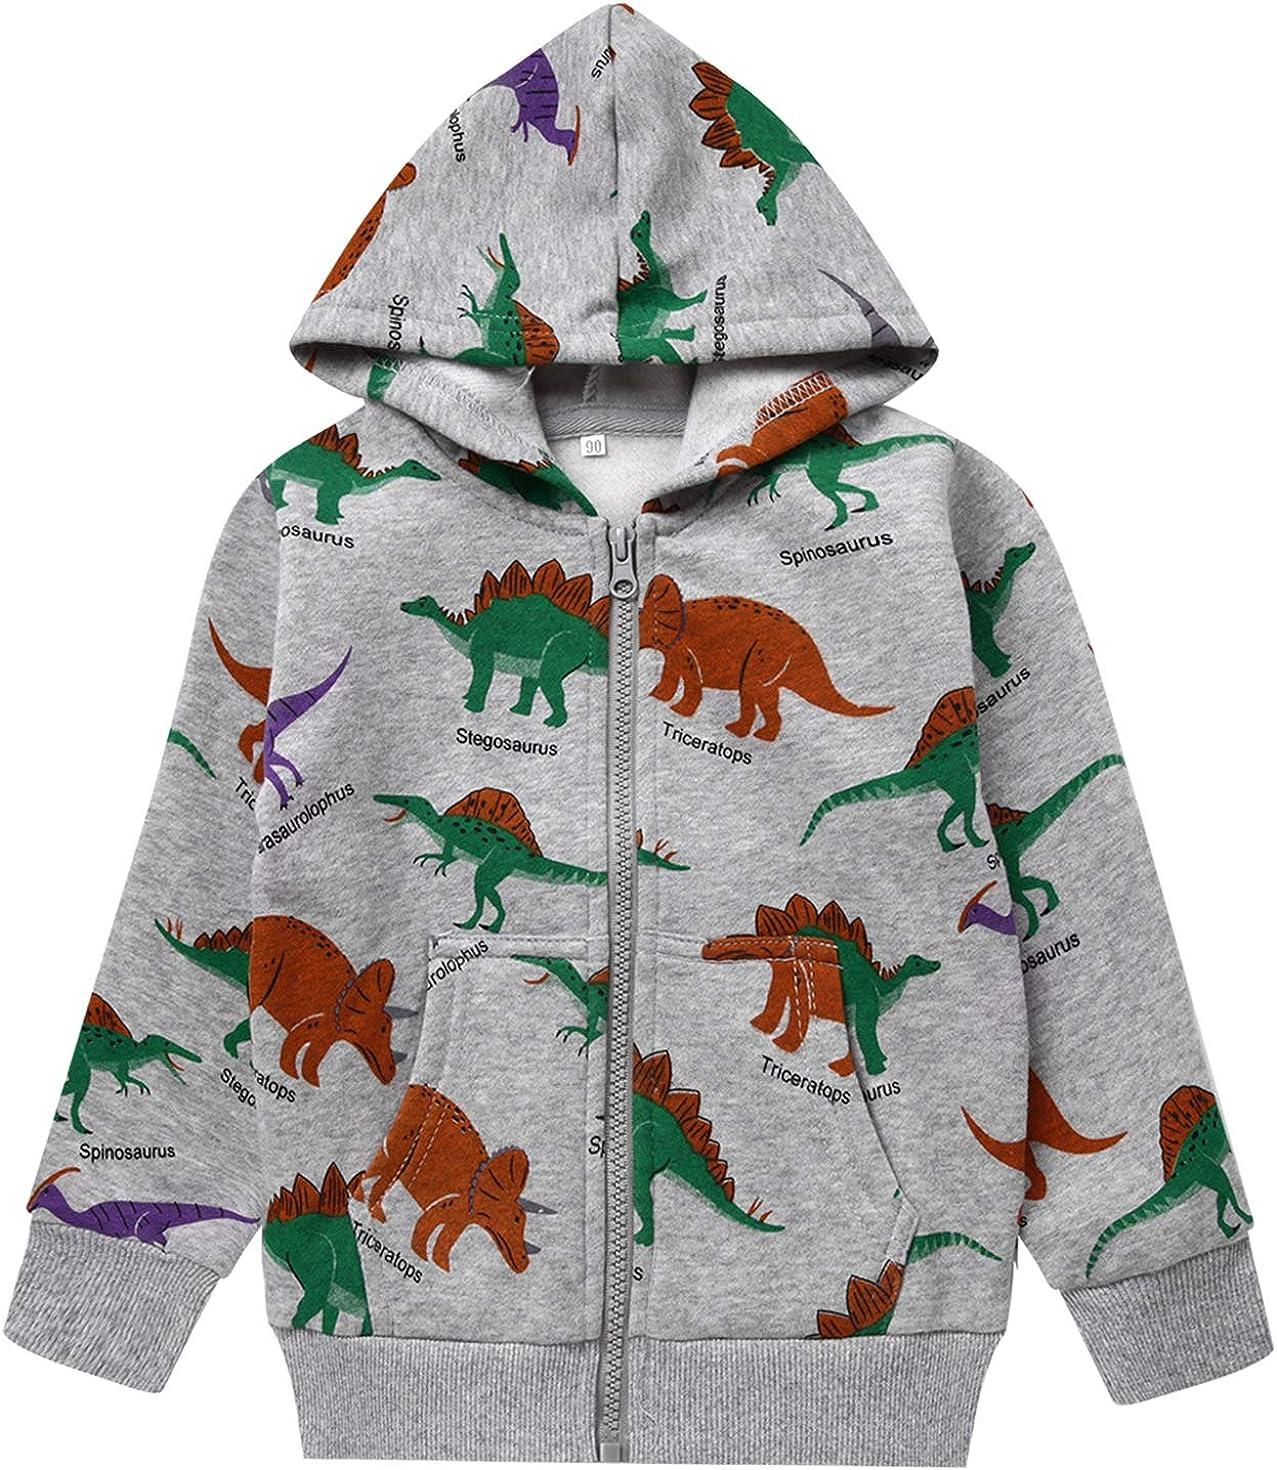 Toddler Boys Dinosaur Sweatshirts Cartoon Winter Long Sleeve Kids Sport Outdoor Pullover Tops Tees 2T-8T: Clothing